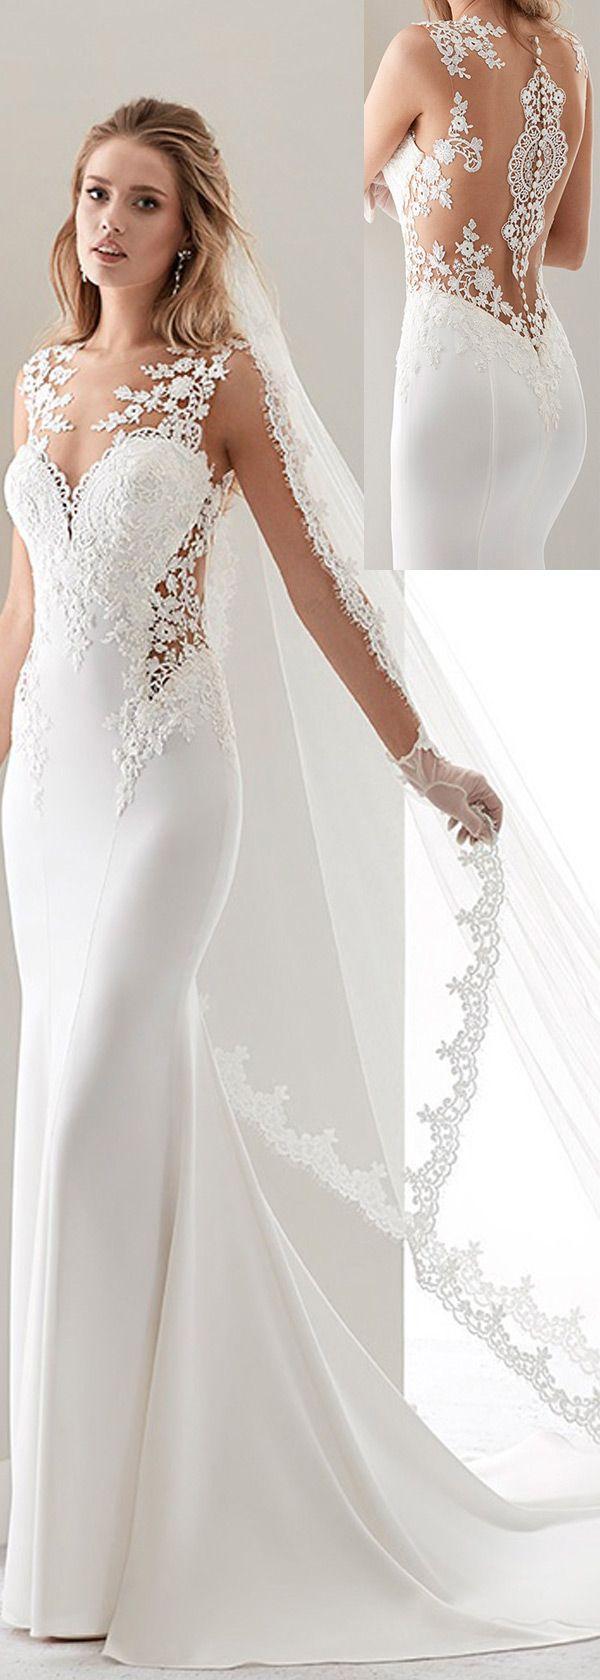 Fashionable tulle u acetate satin jewel neckline sheath wedding